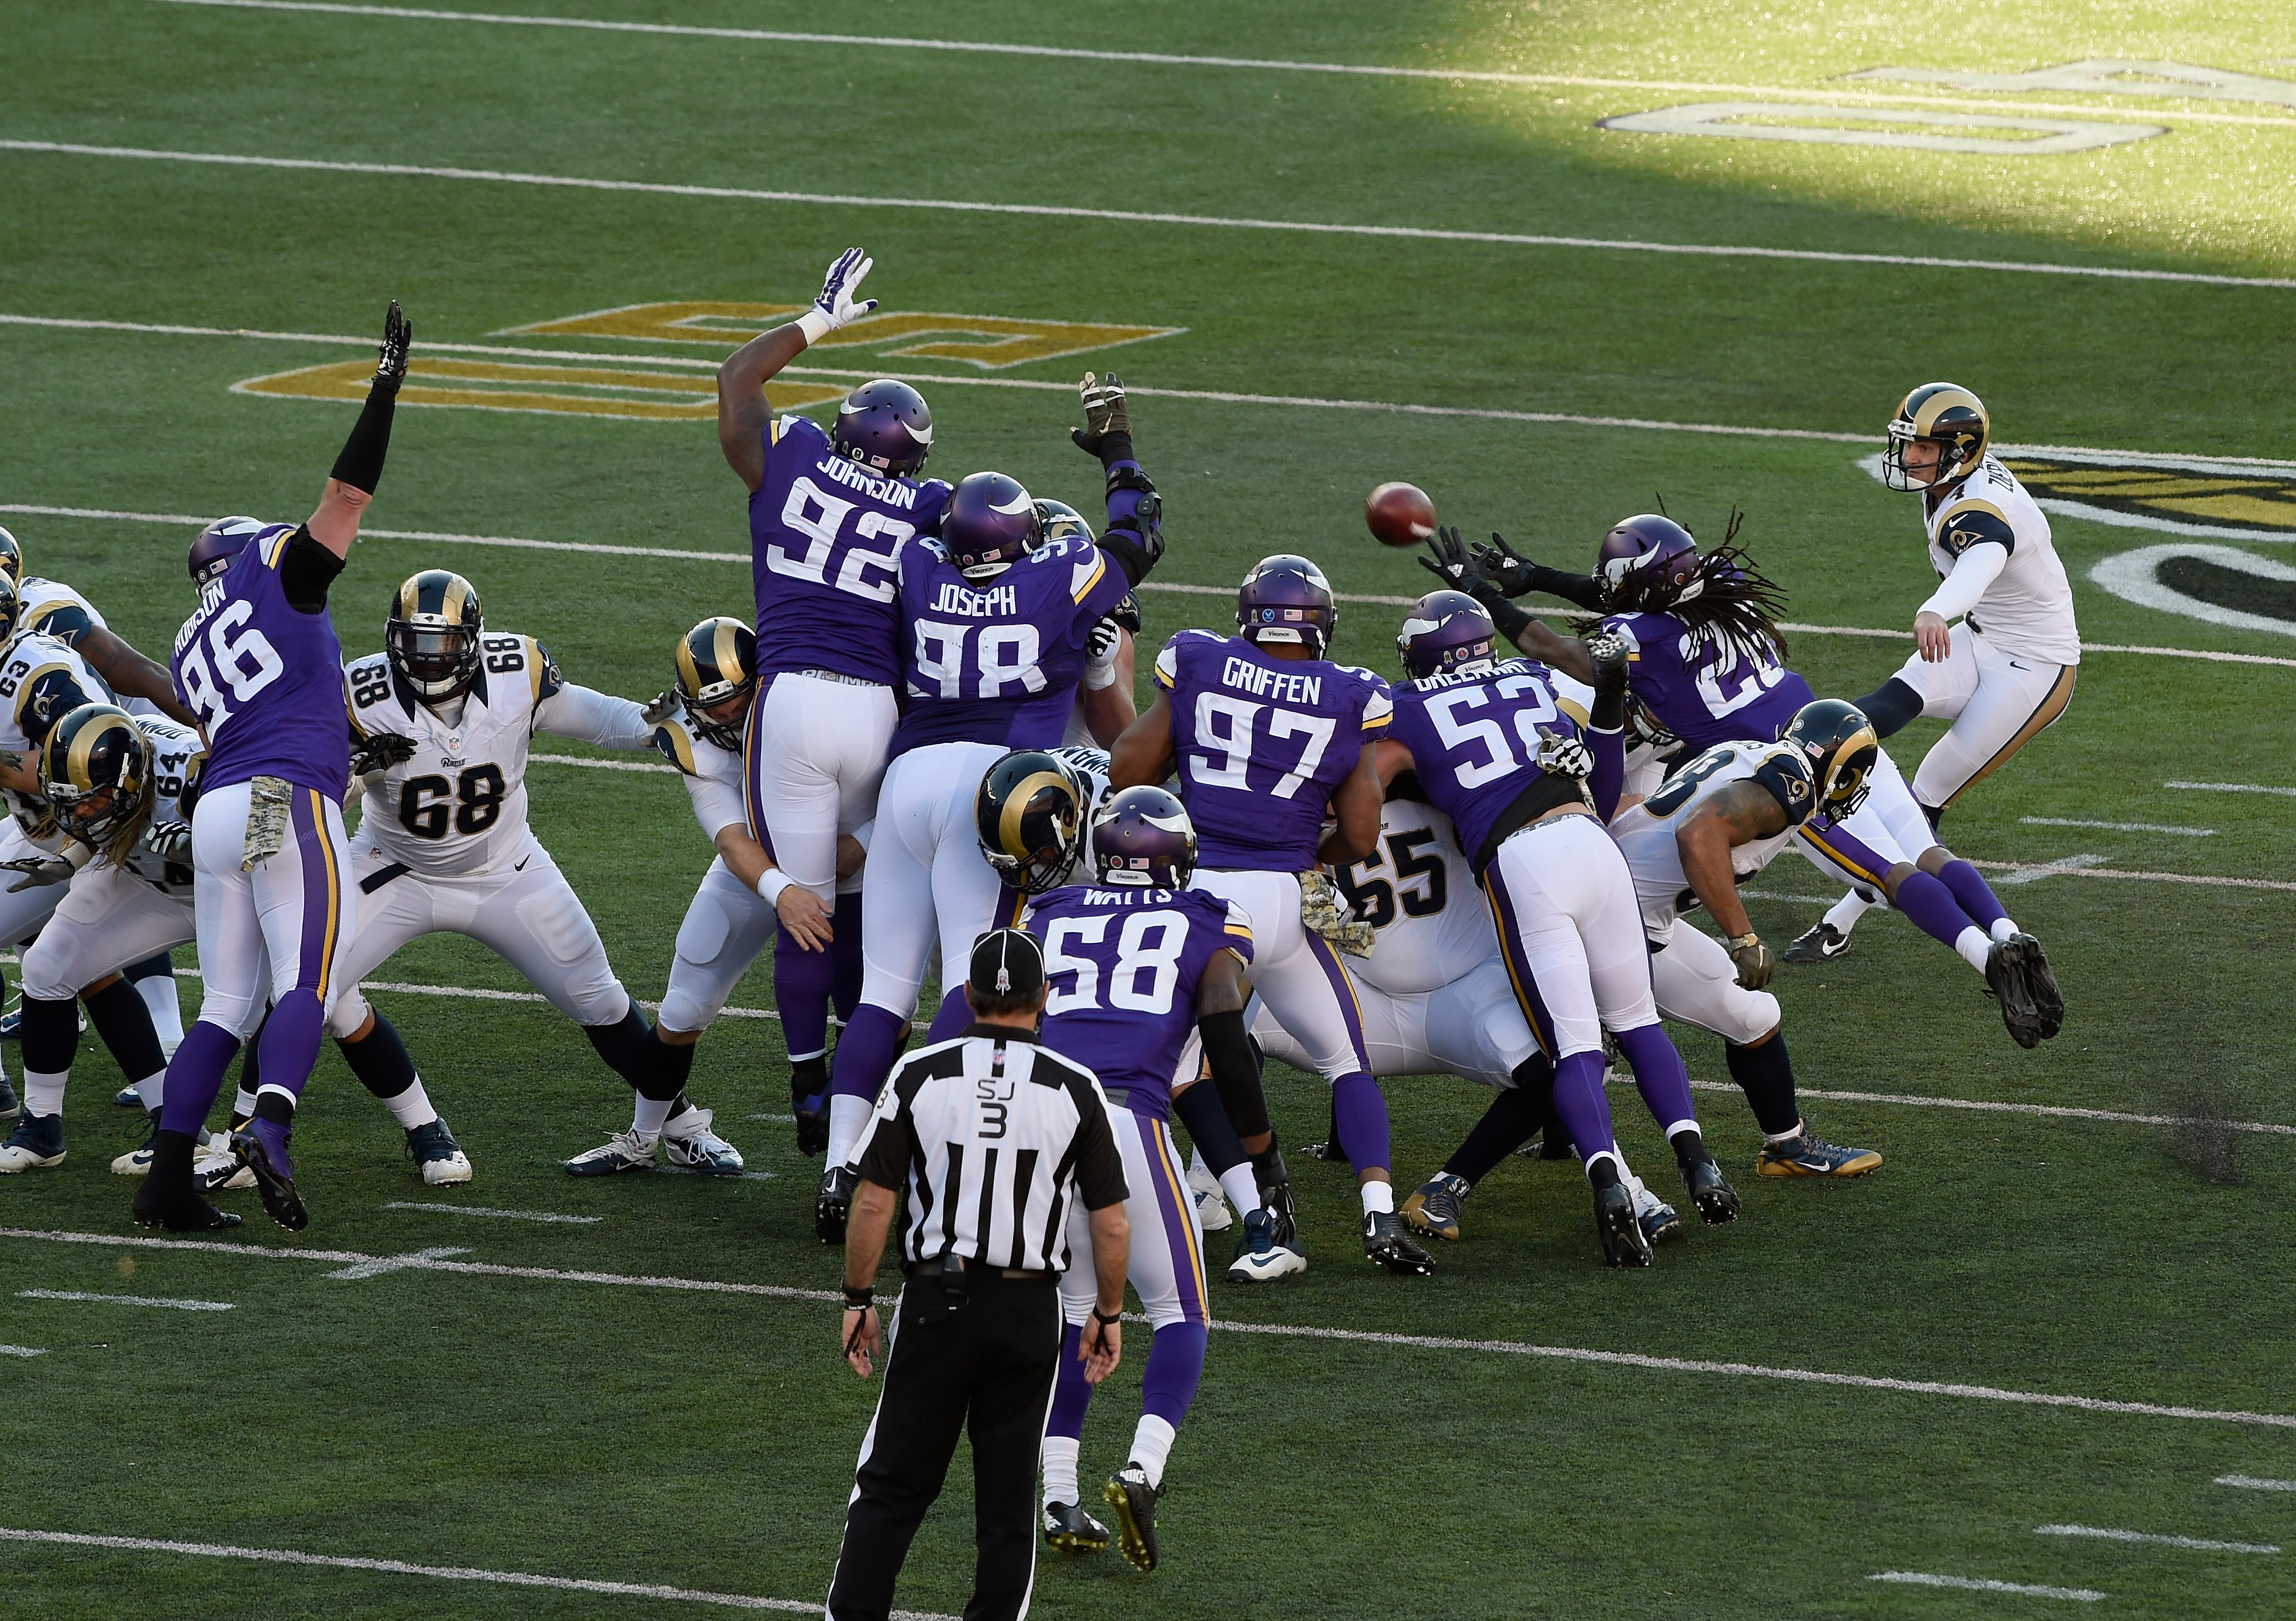 2015 St. Louis Rams at Minnesota Vikings